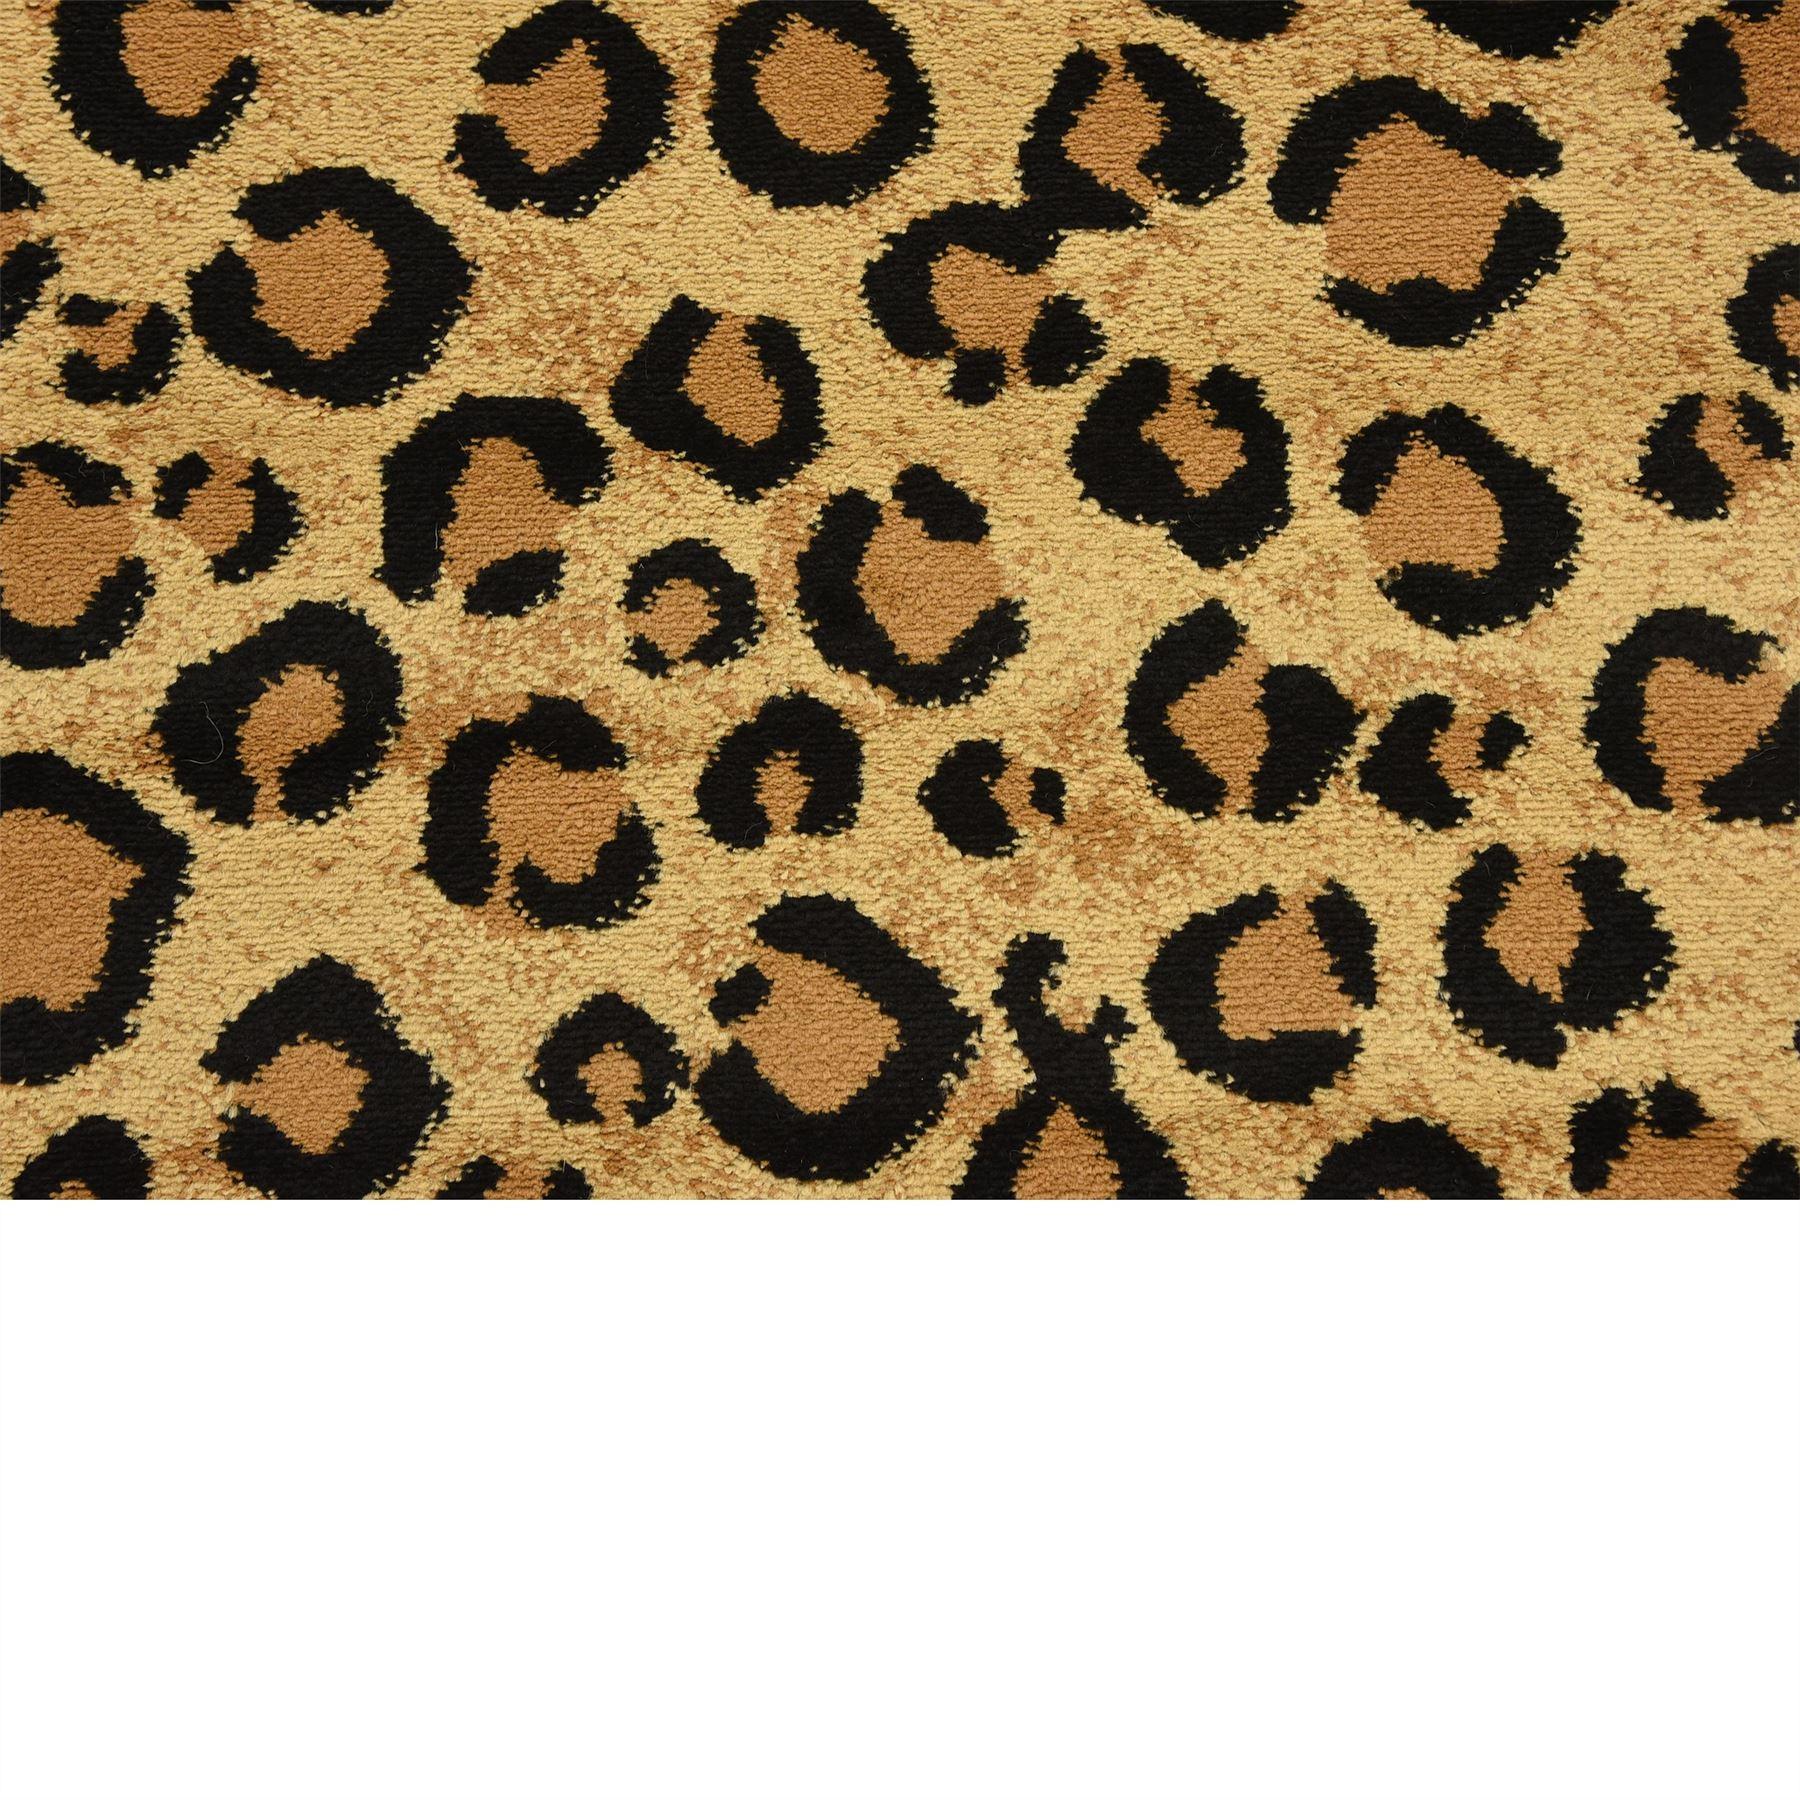 Modern Leopard Skin Style Area Rug Contemporary Animal